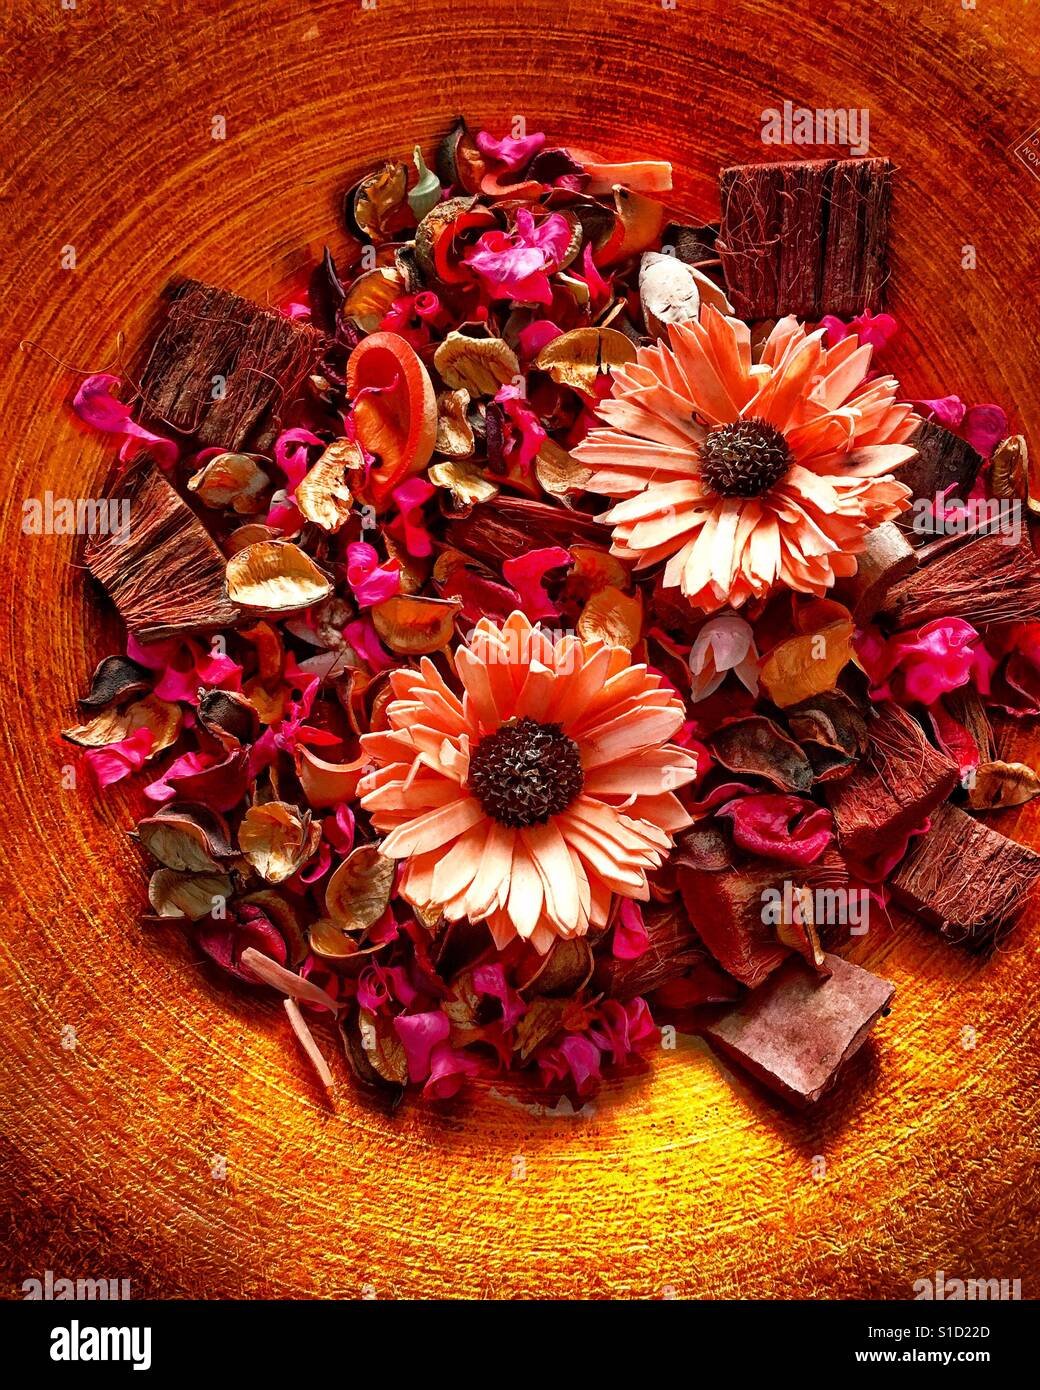 Duftende Blüten Stockfoto